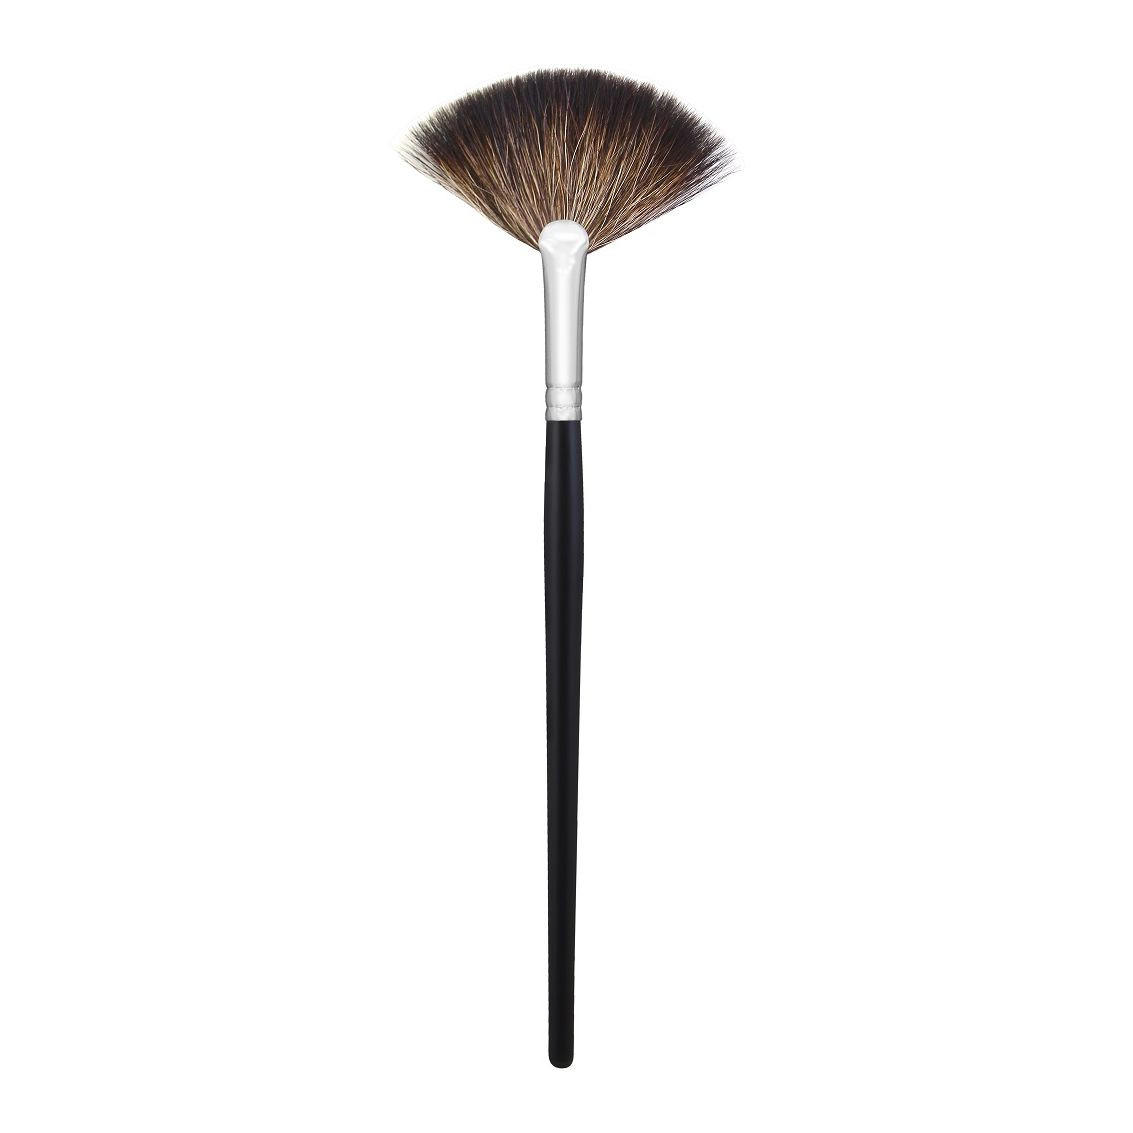 Morphe Soft Fan Brush M601